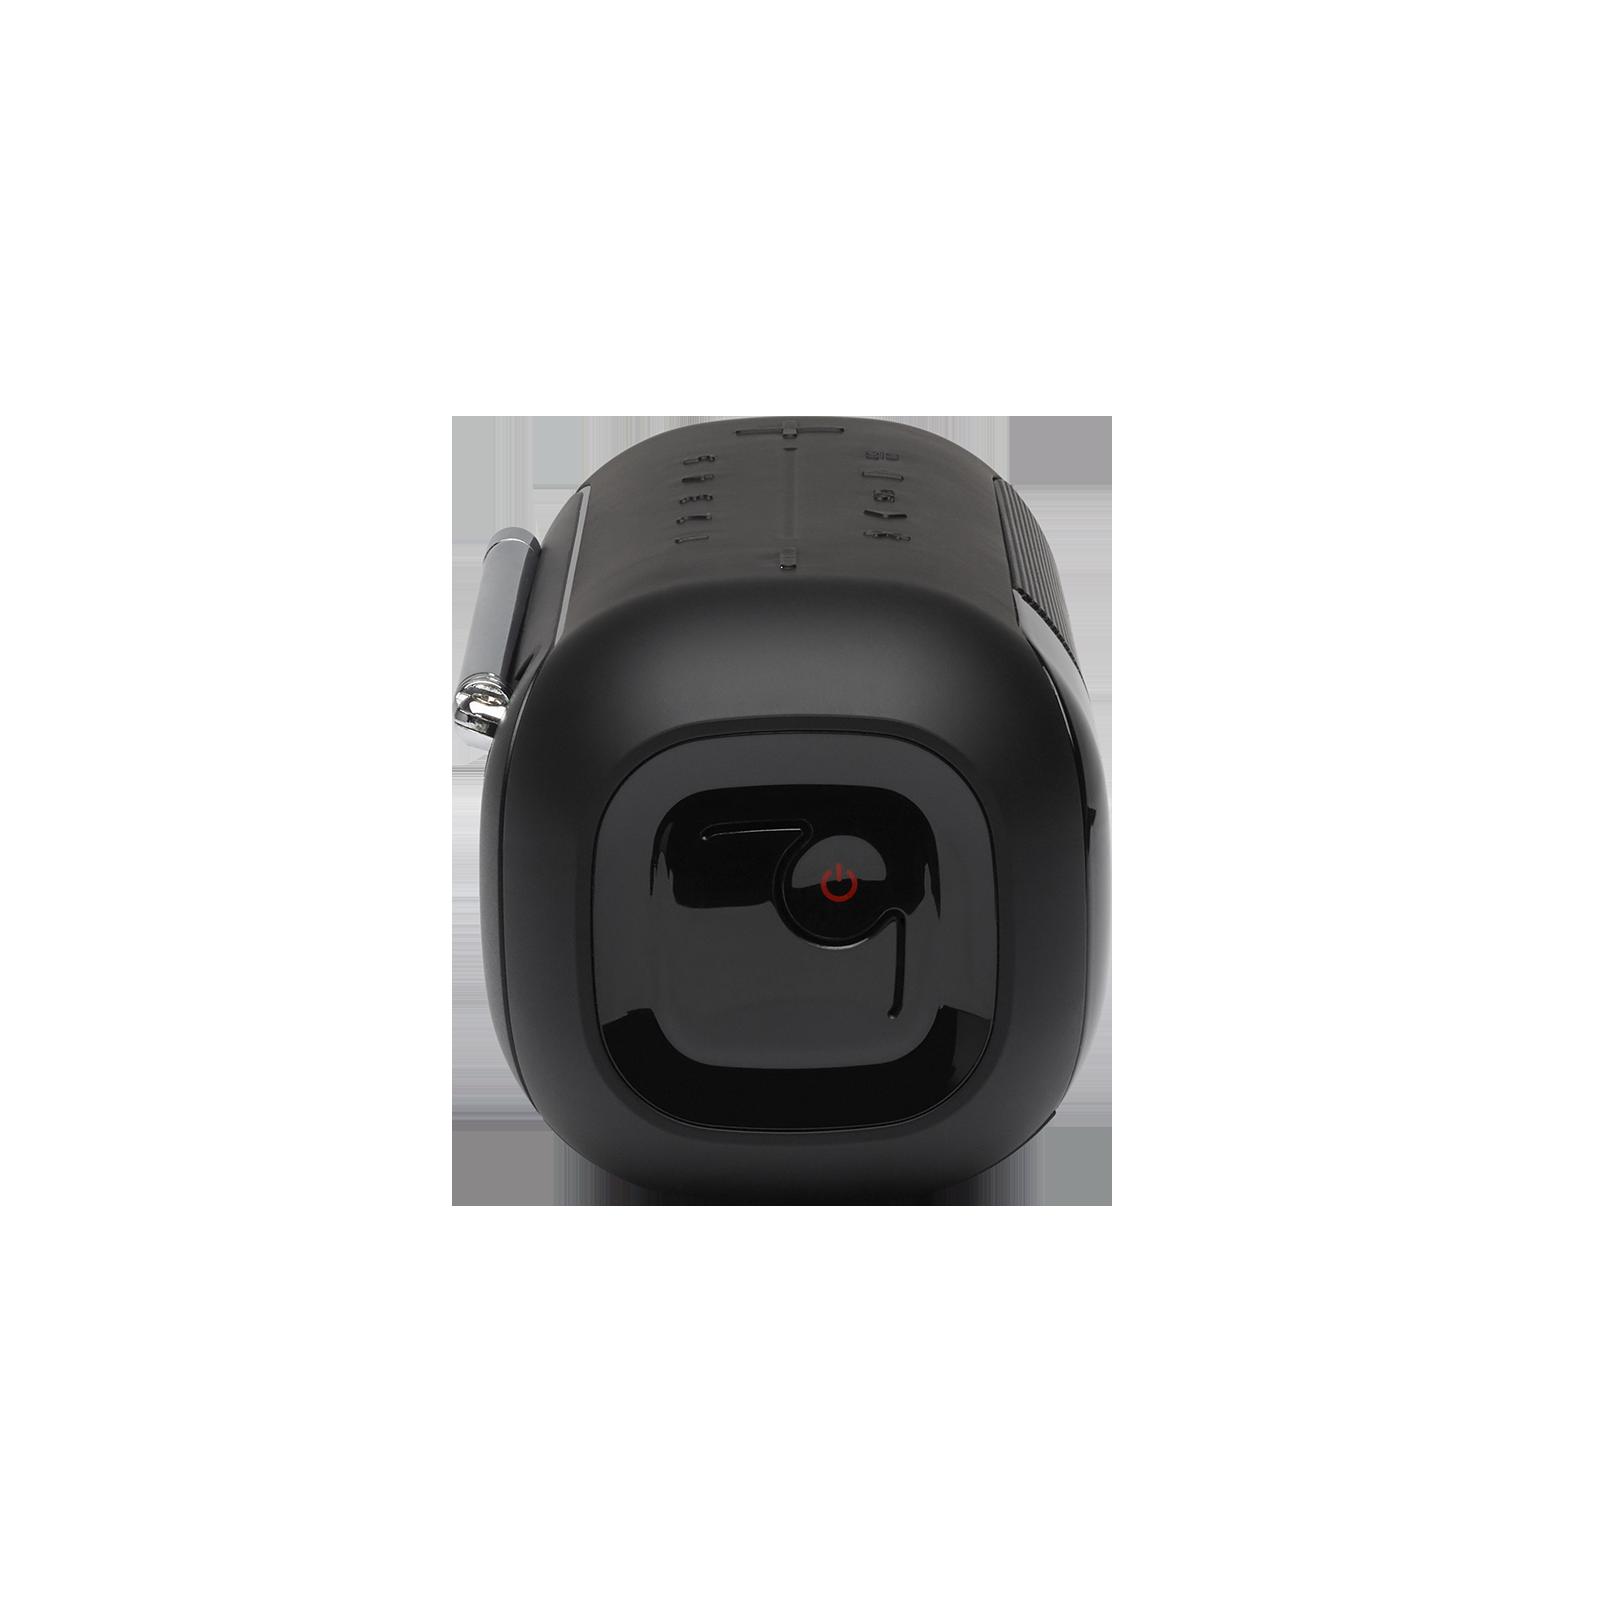 JBL Tuner 2 - Black - Portable DAB/DAB+/FM radio with Bluetooth - Detailshot 1